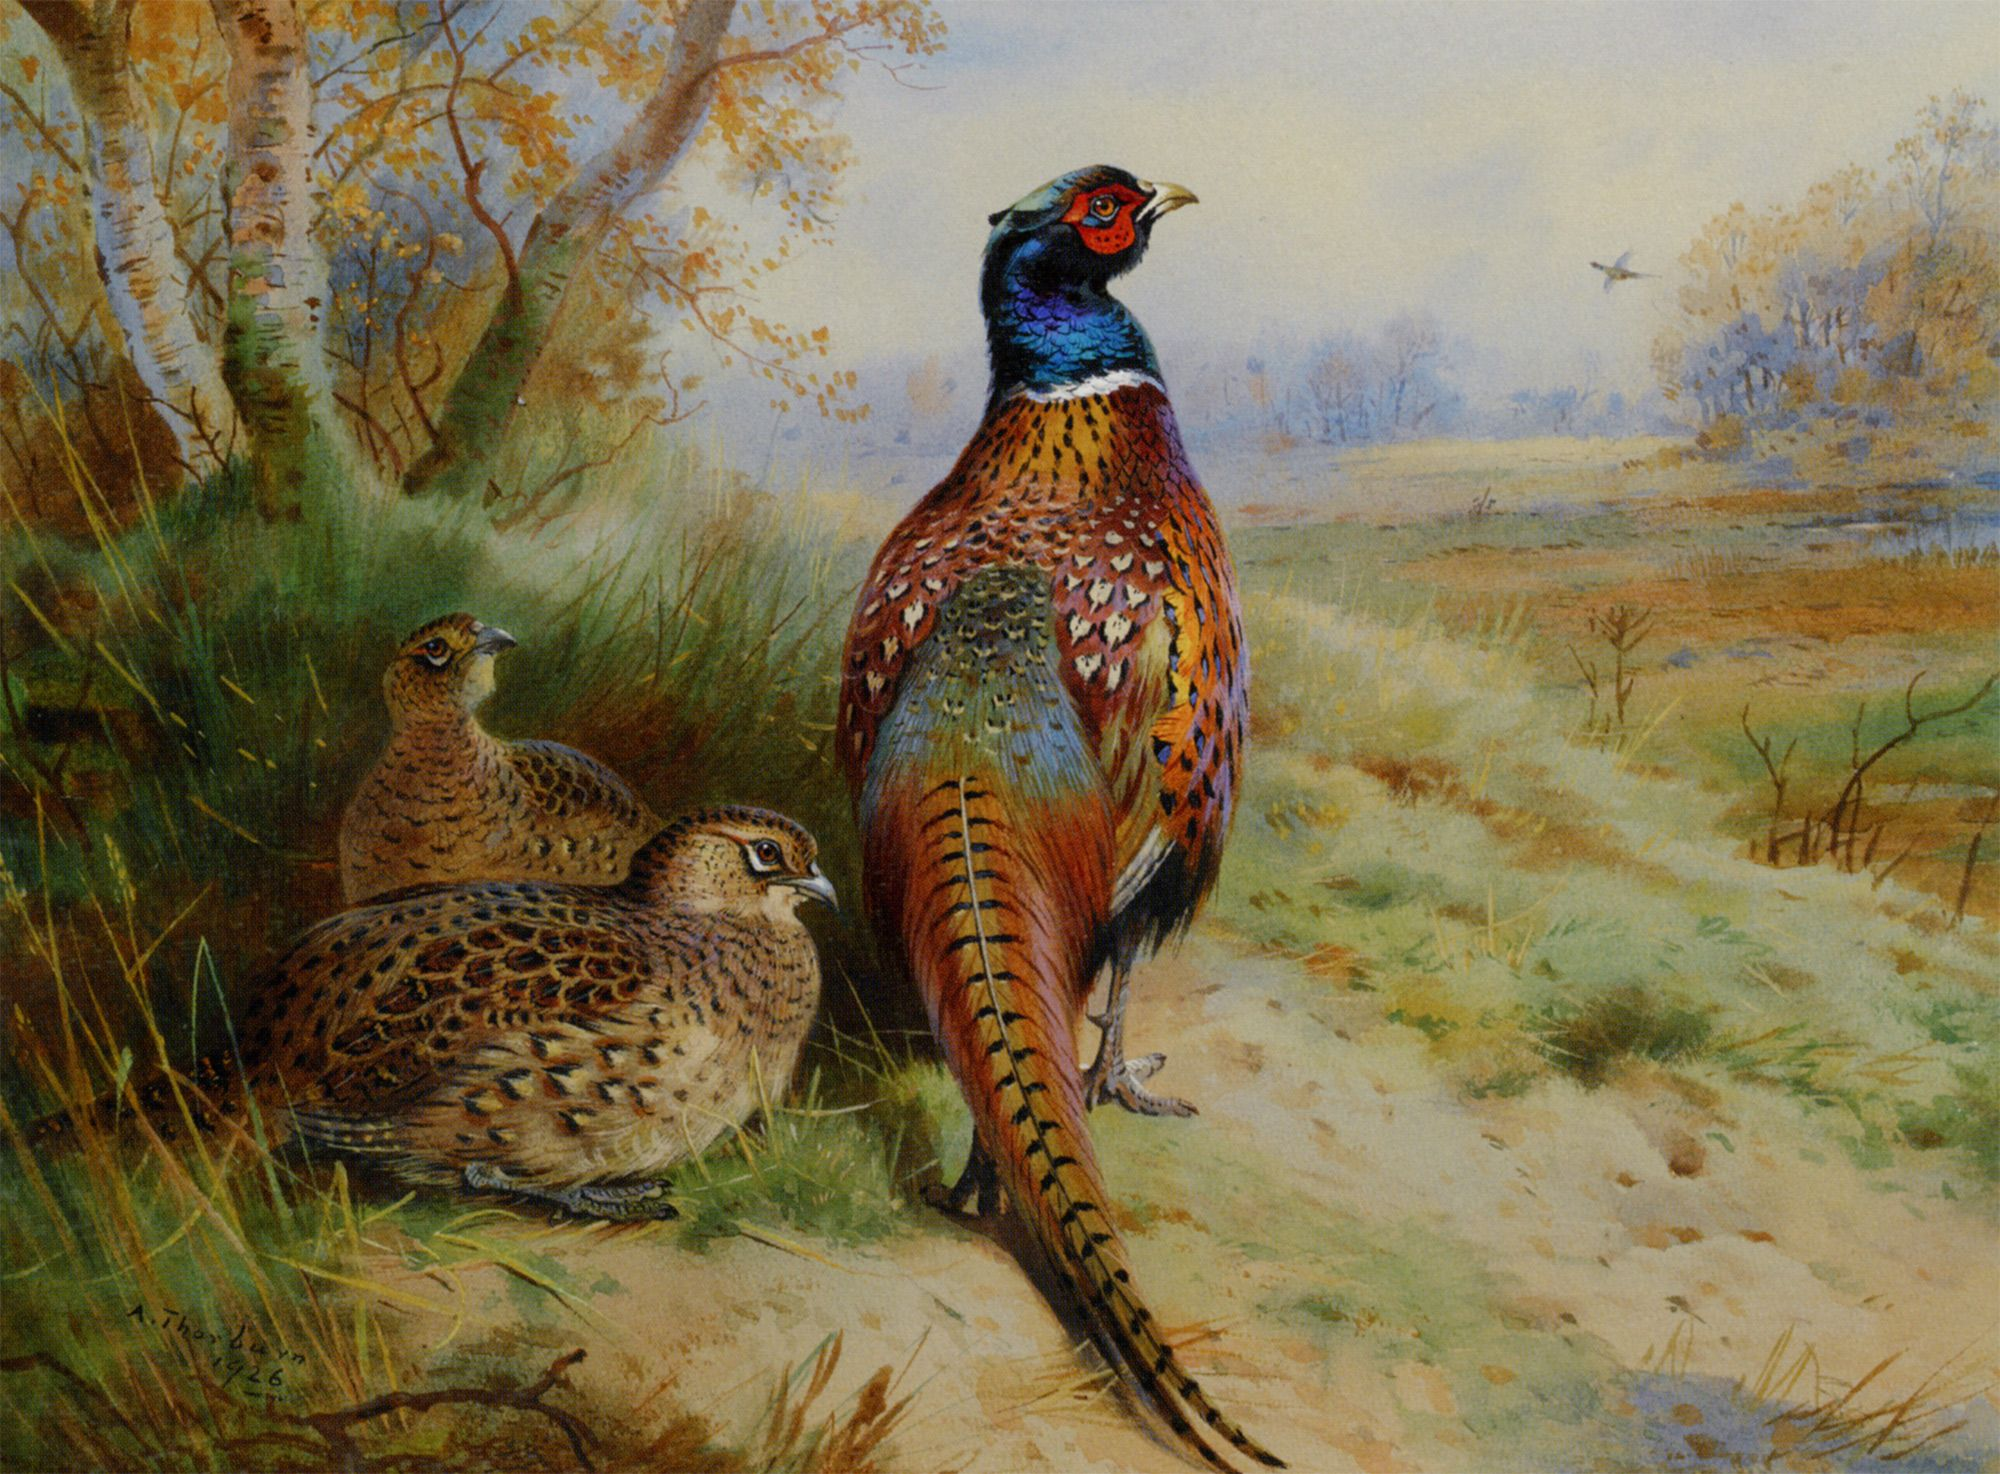 pheasants game birds pinterest pheasant bird and wildlife